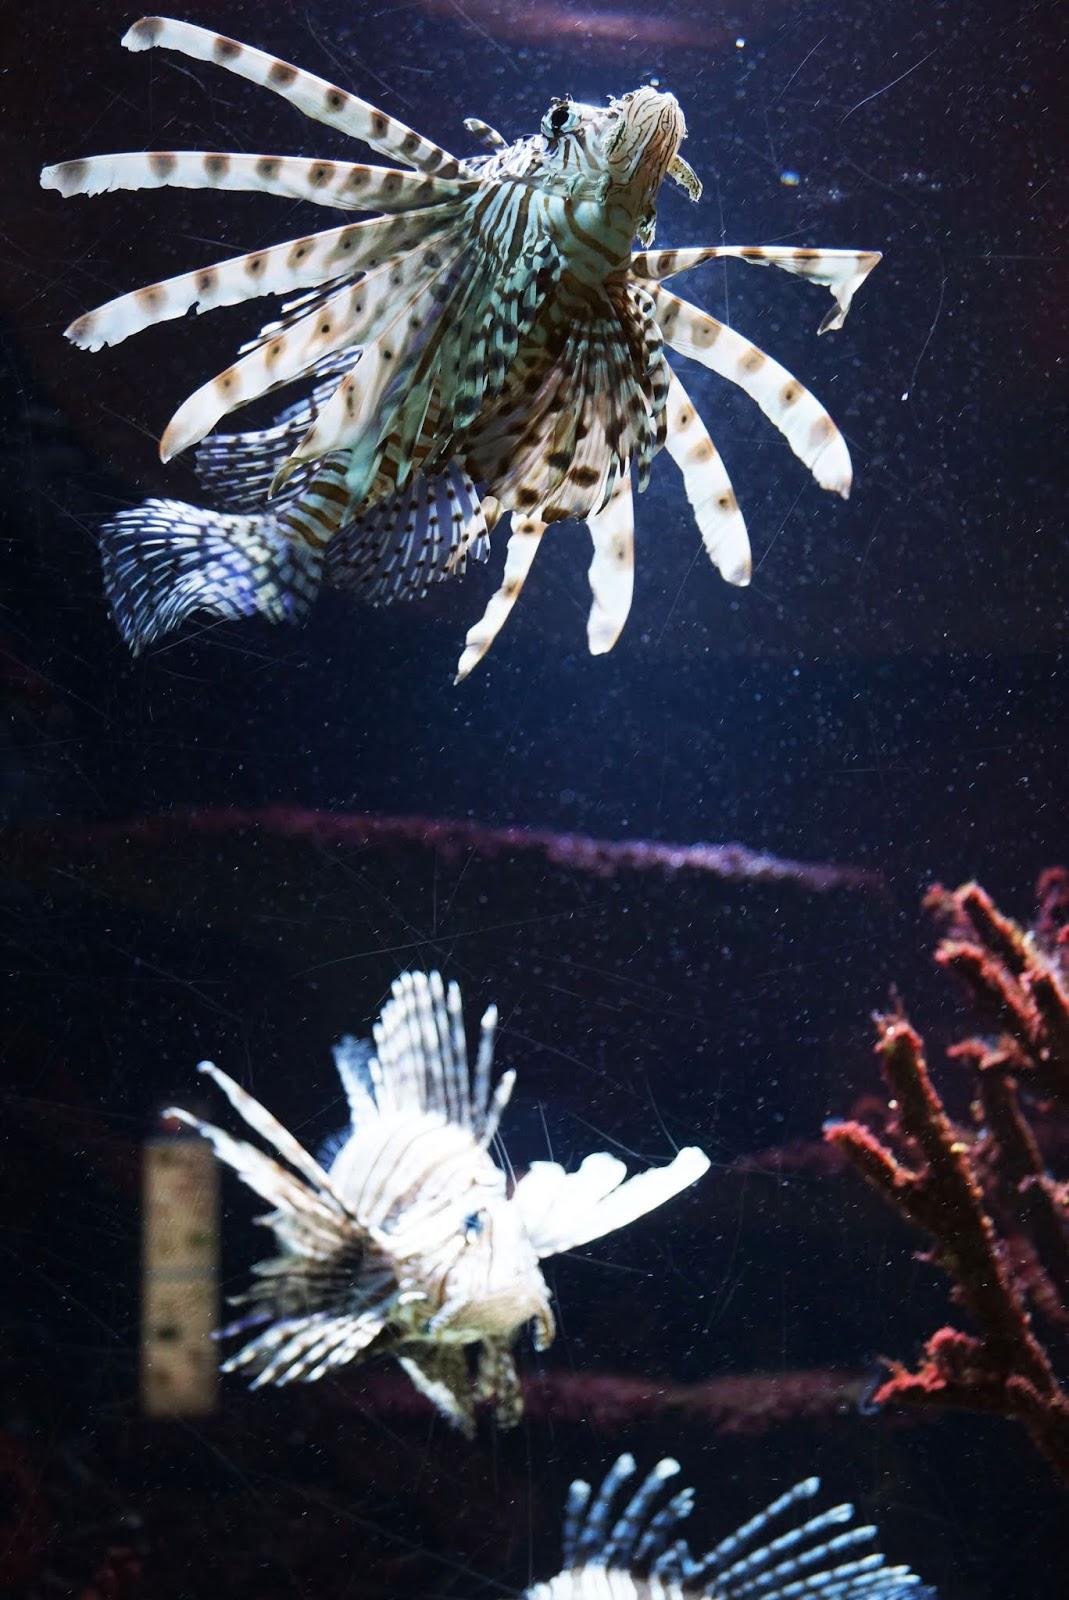 aquarium_berlin